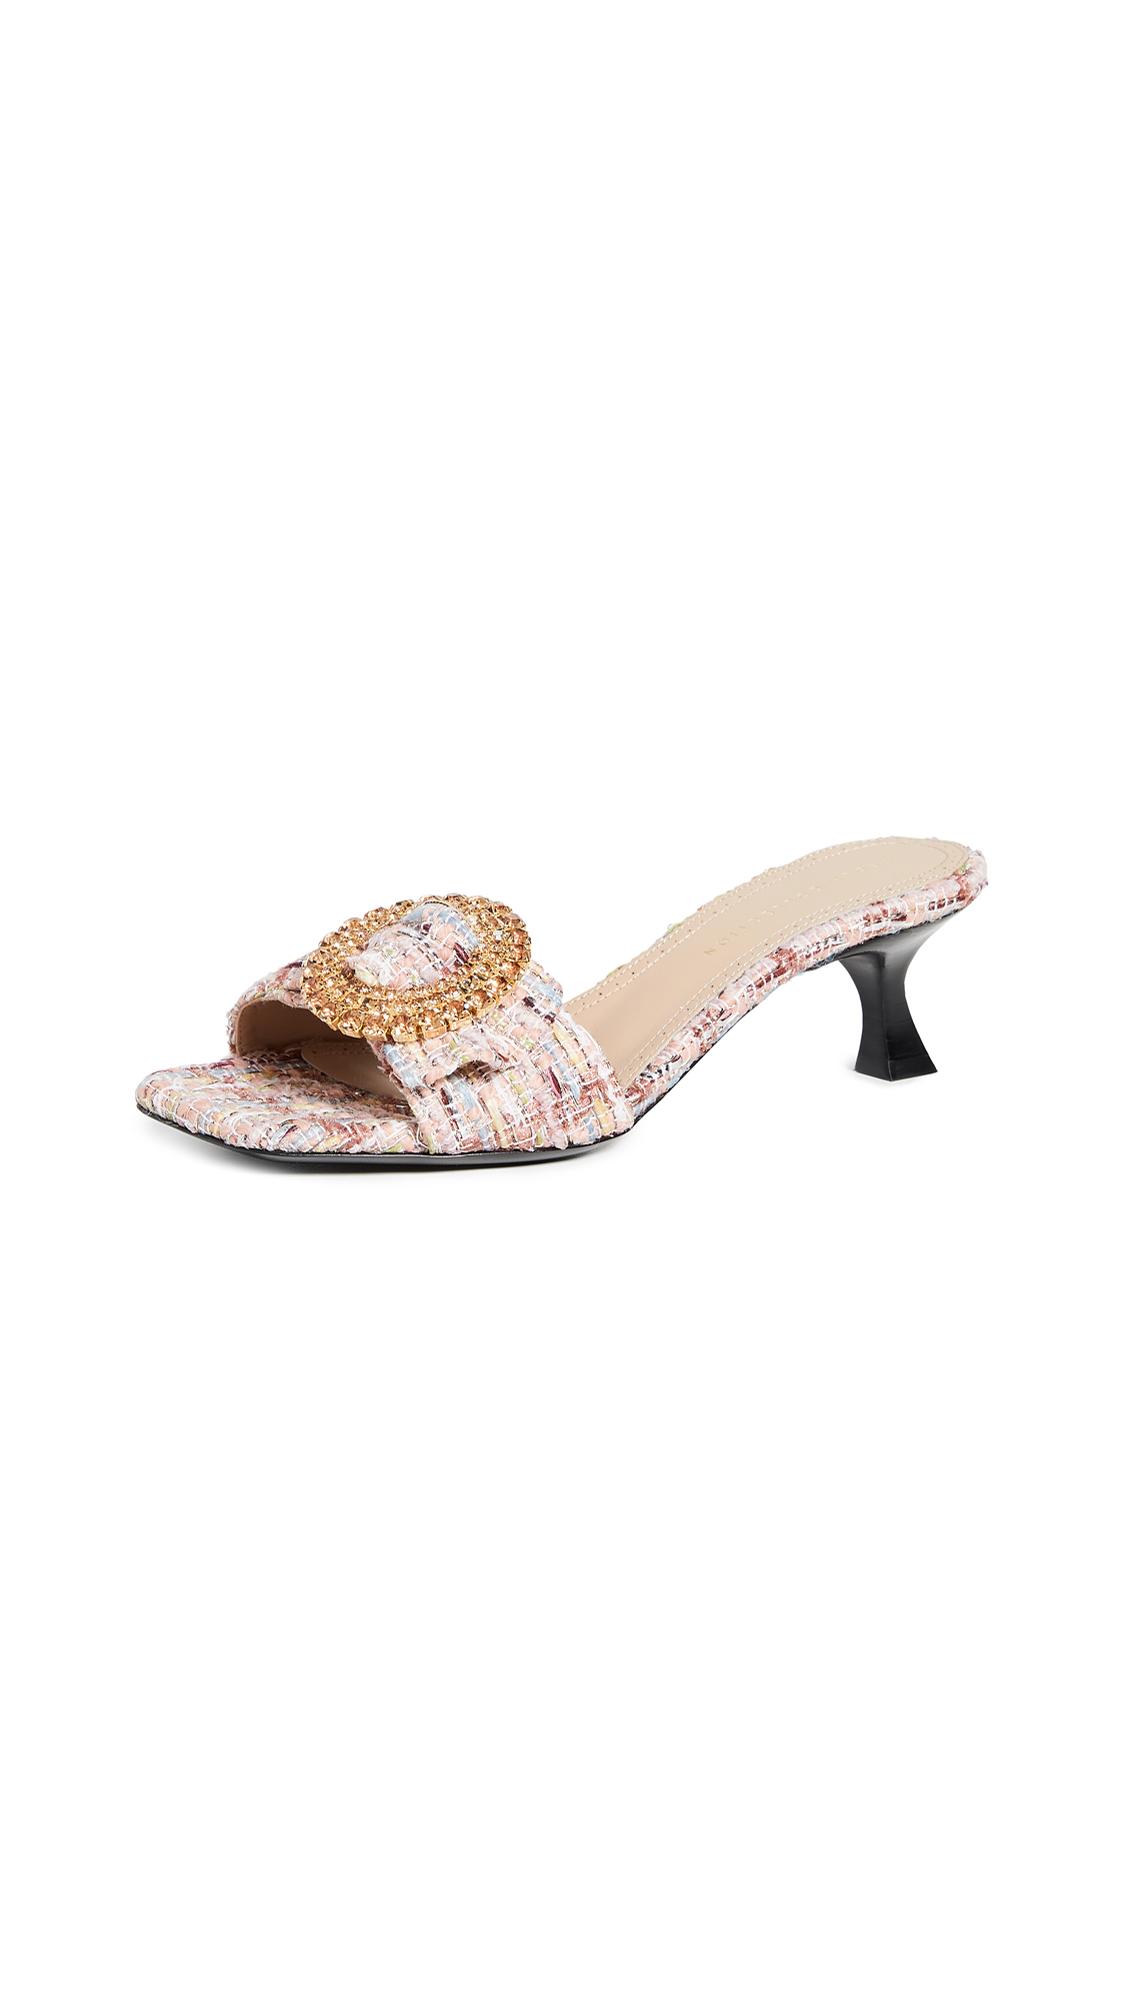 Brock Collection Boucle Metallic Slides - Light Pink